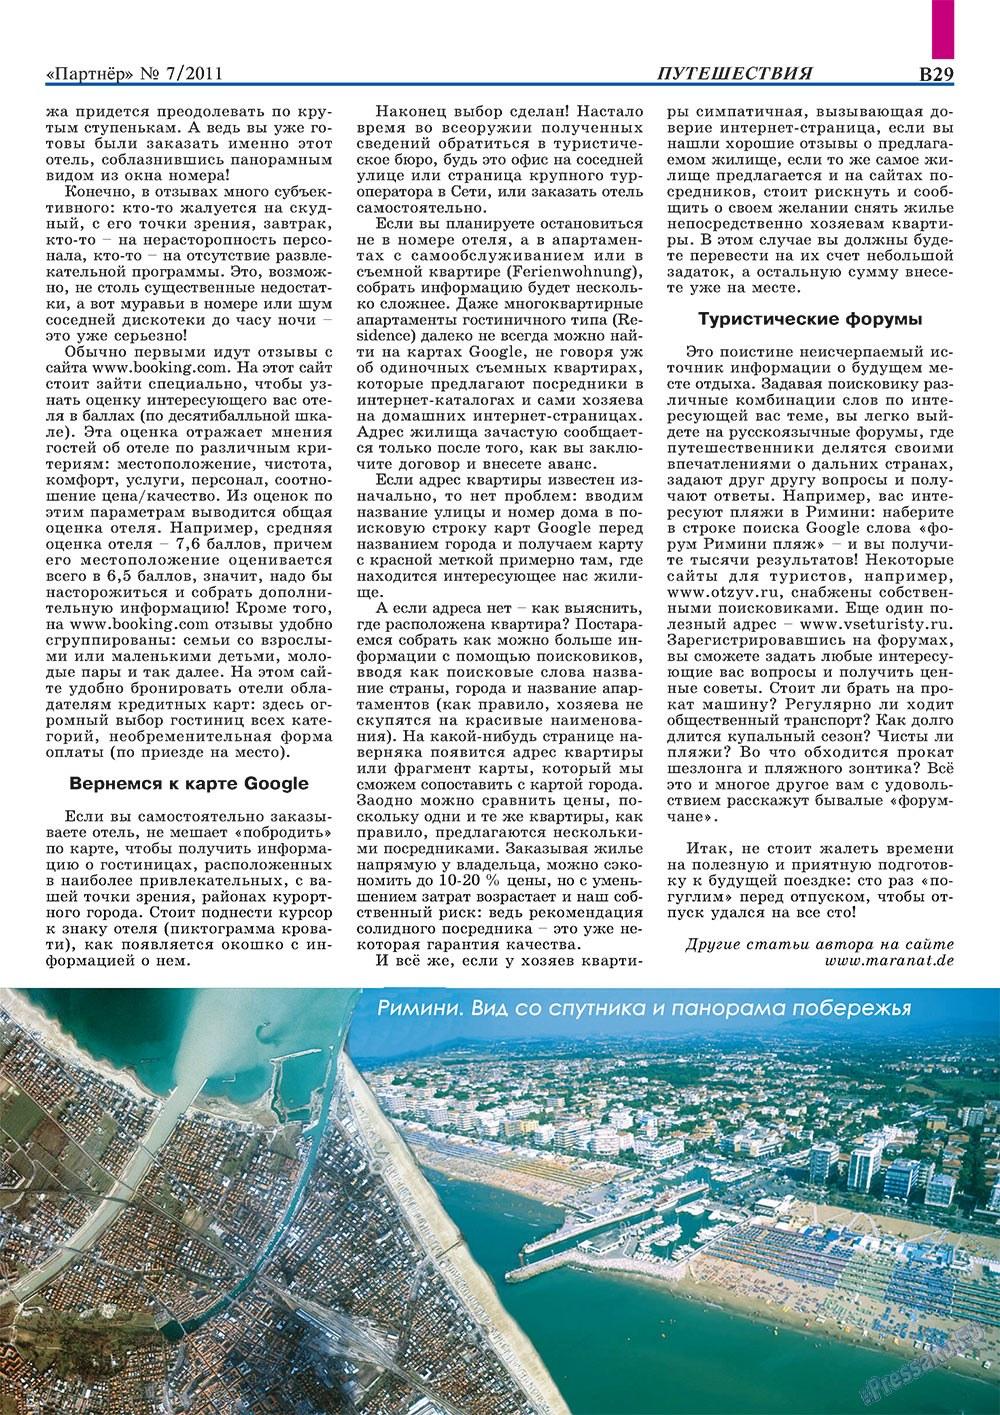 Партнер-север (журнал). 2011 год, номер 7, стр. 39